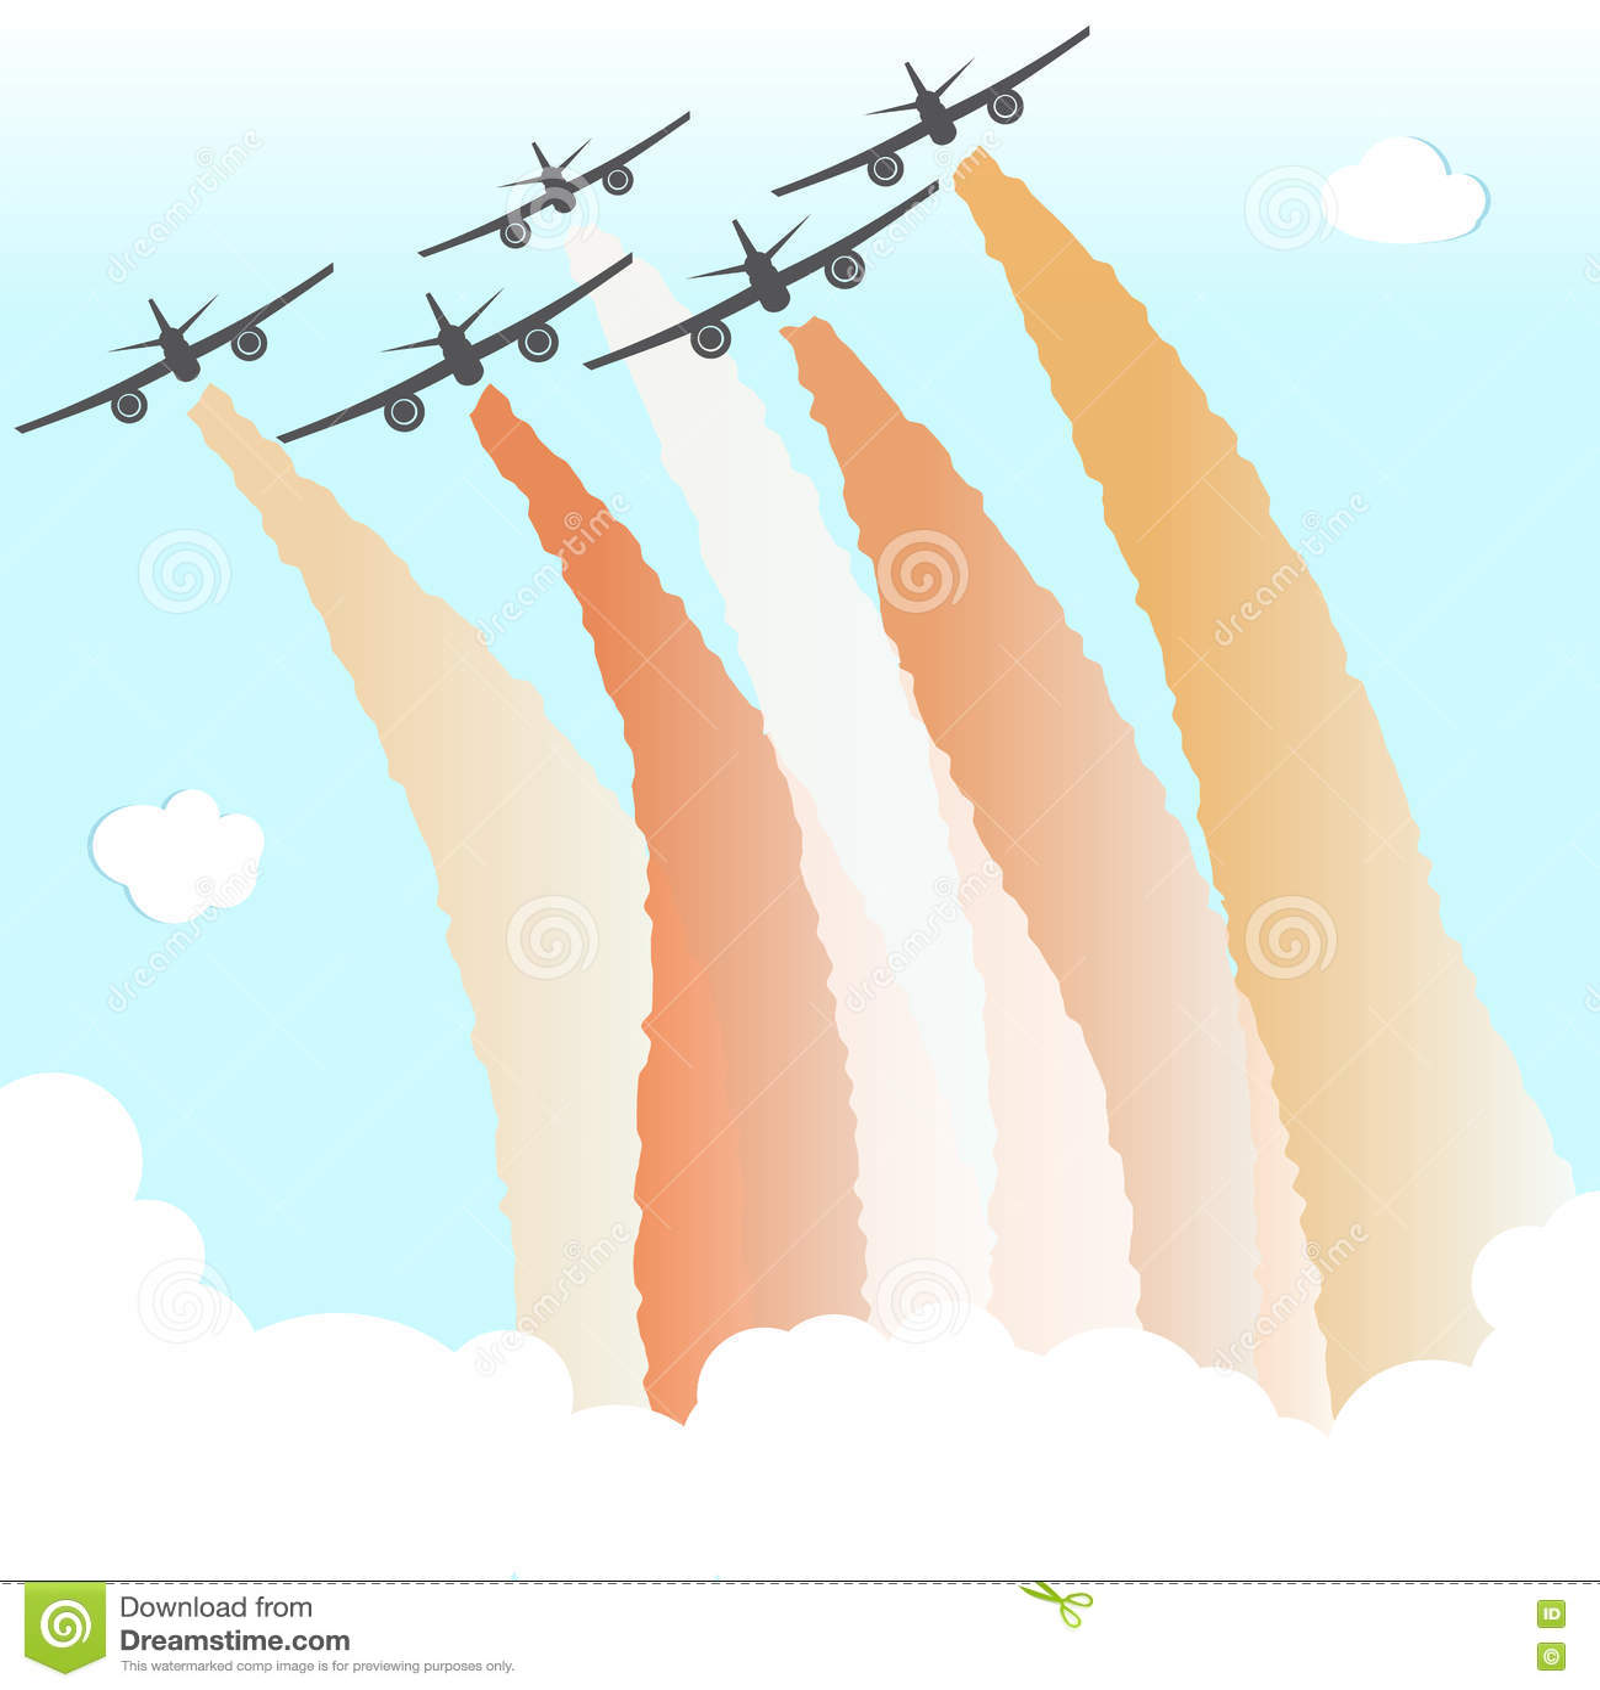 Smoke Color Sky Plane Parade Group Airplane Fly Peace Joy Vector Illustration